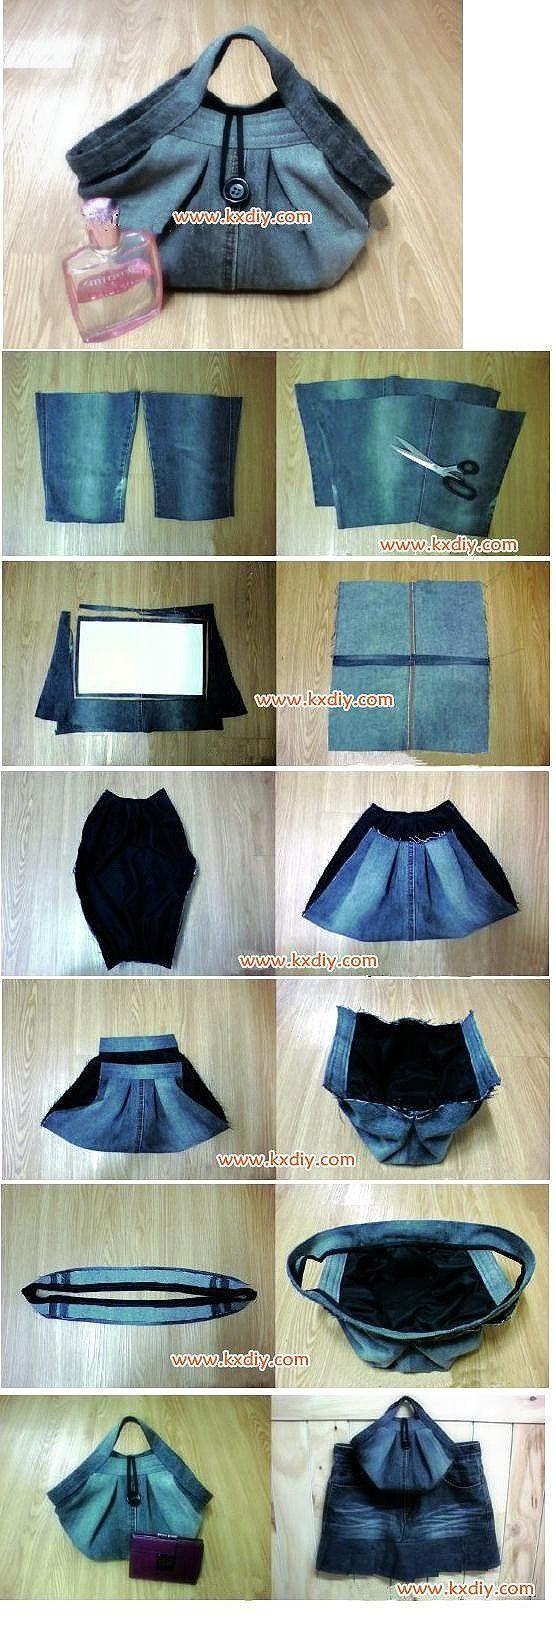 DIY Stylish Handbag from Used Jeans 2